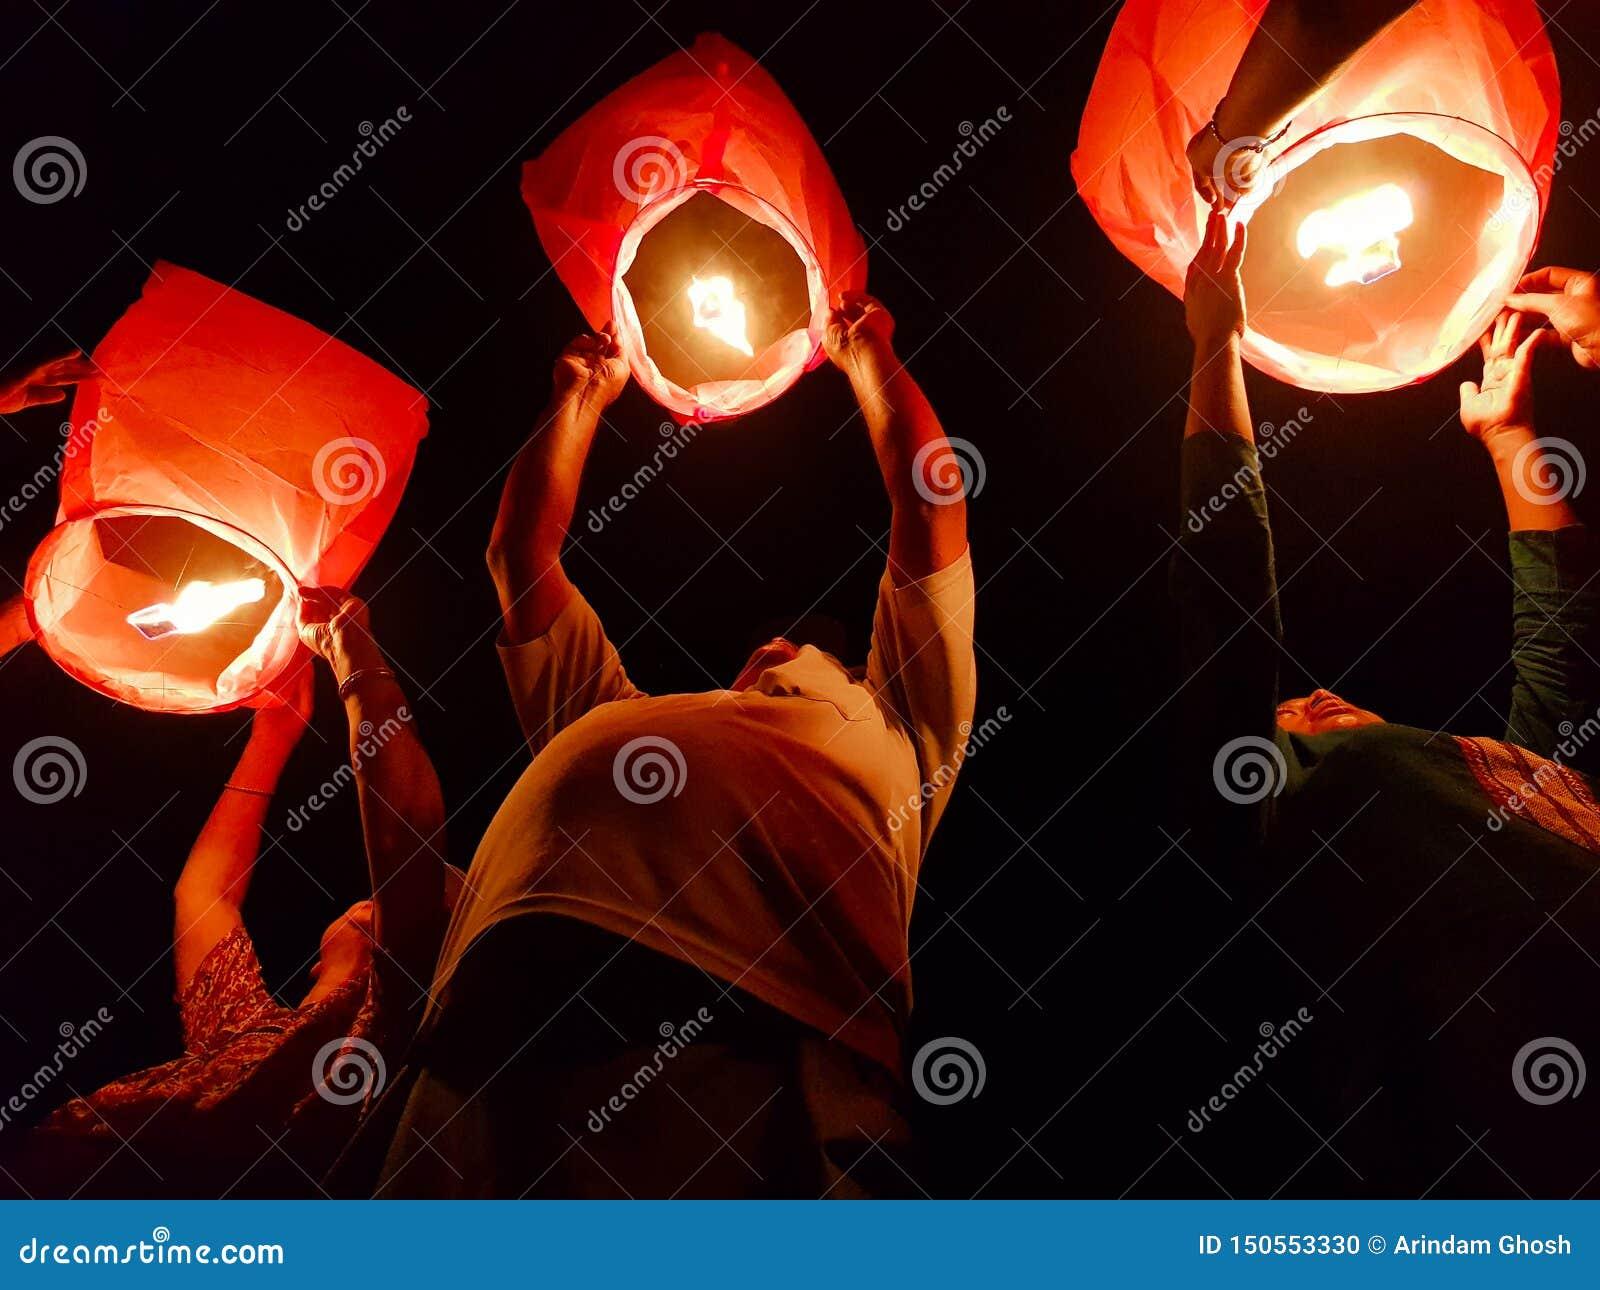 November 2018, Kolkata, India. Three person releasing lighted paper hot air balloon in sky lantern festival at night in Kolkata,